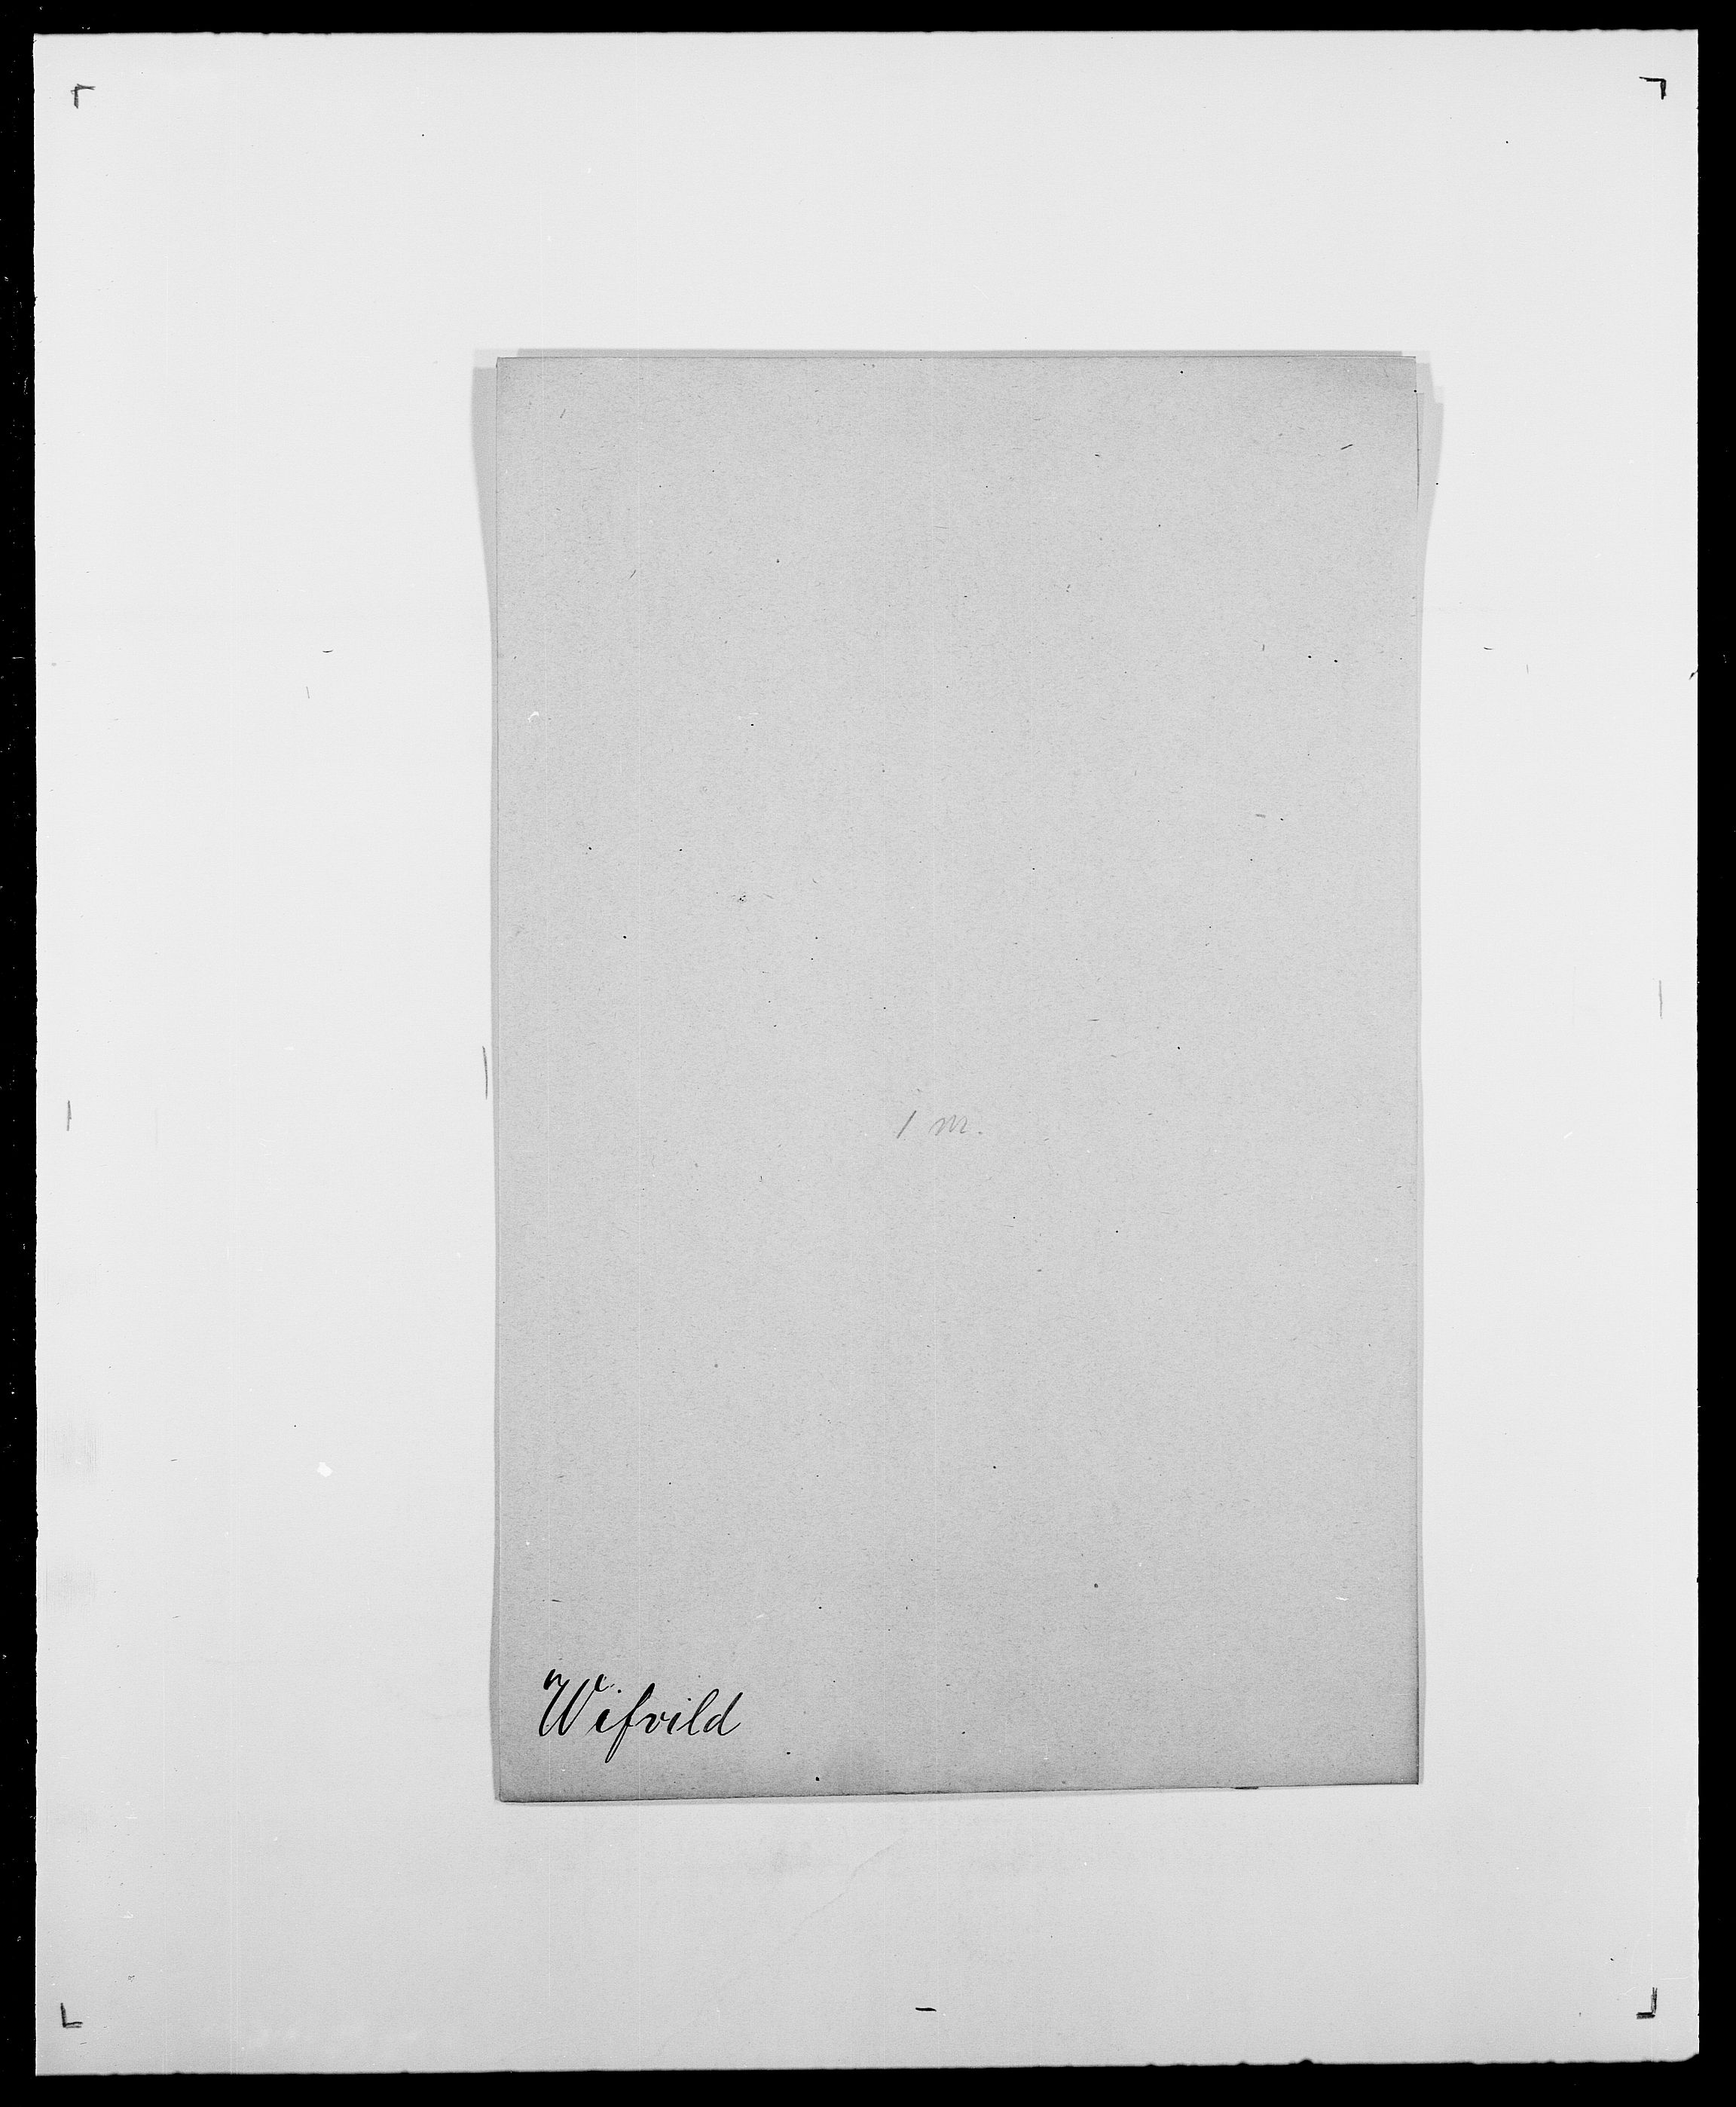 SAO, Delgobe, Charles Antoine - samling, D/Da/L0041: Vemmestad - Viker, s. 664